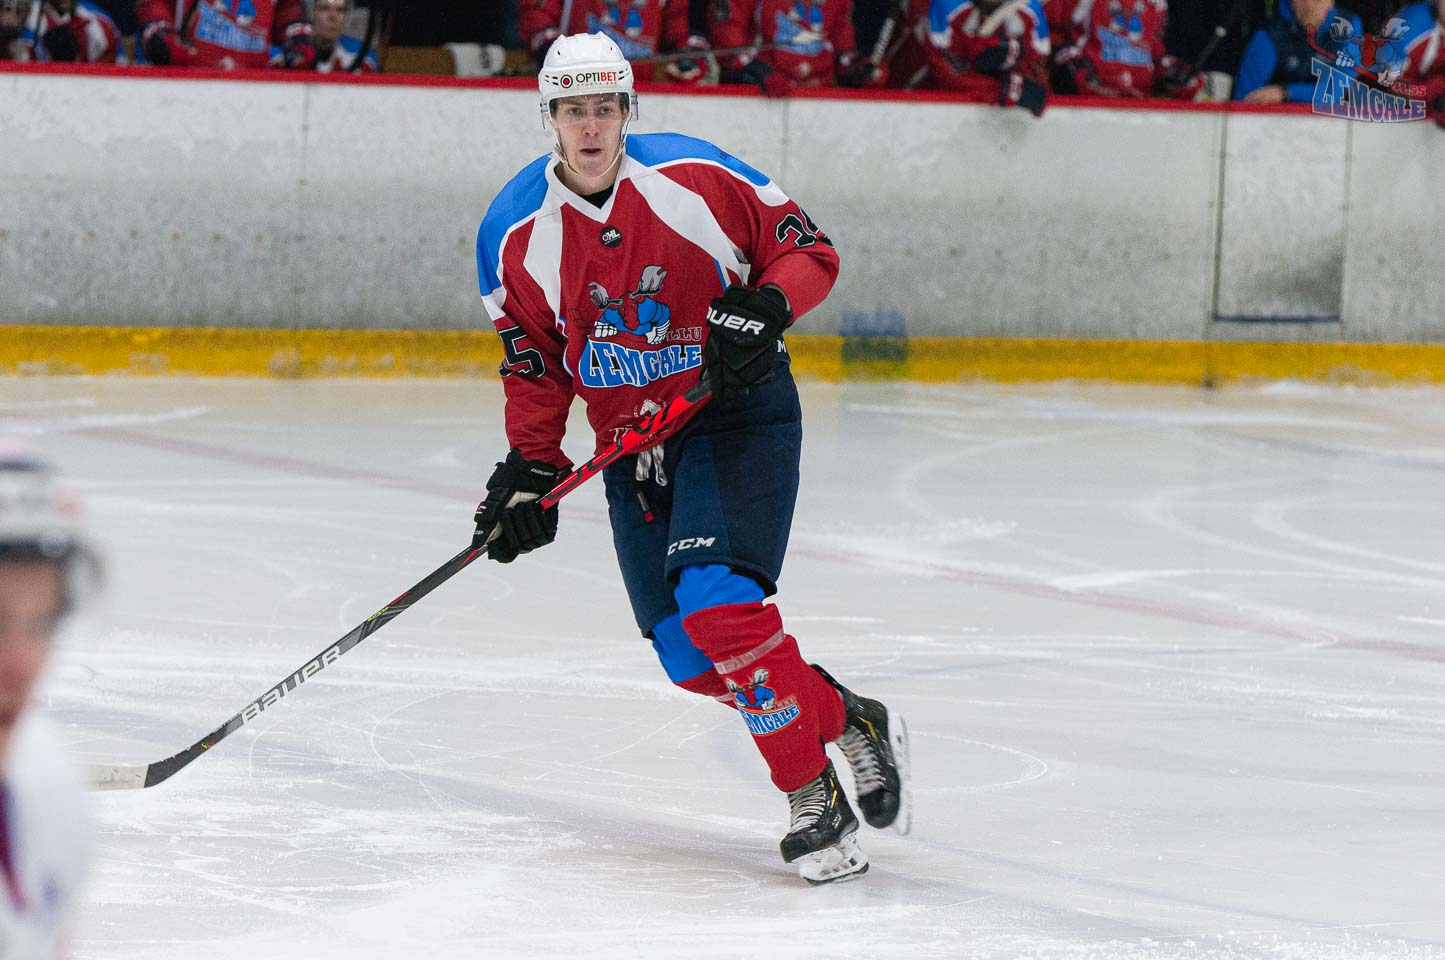 Gara auguma hokejists uz ledus slido ar nūju